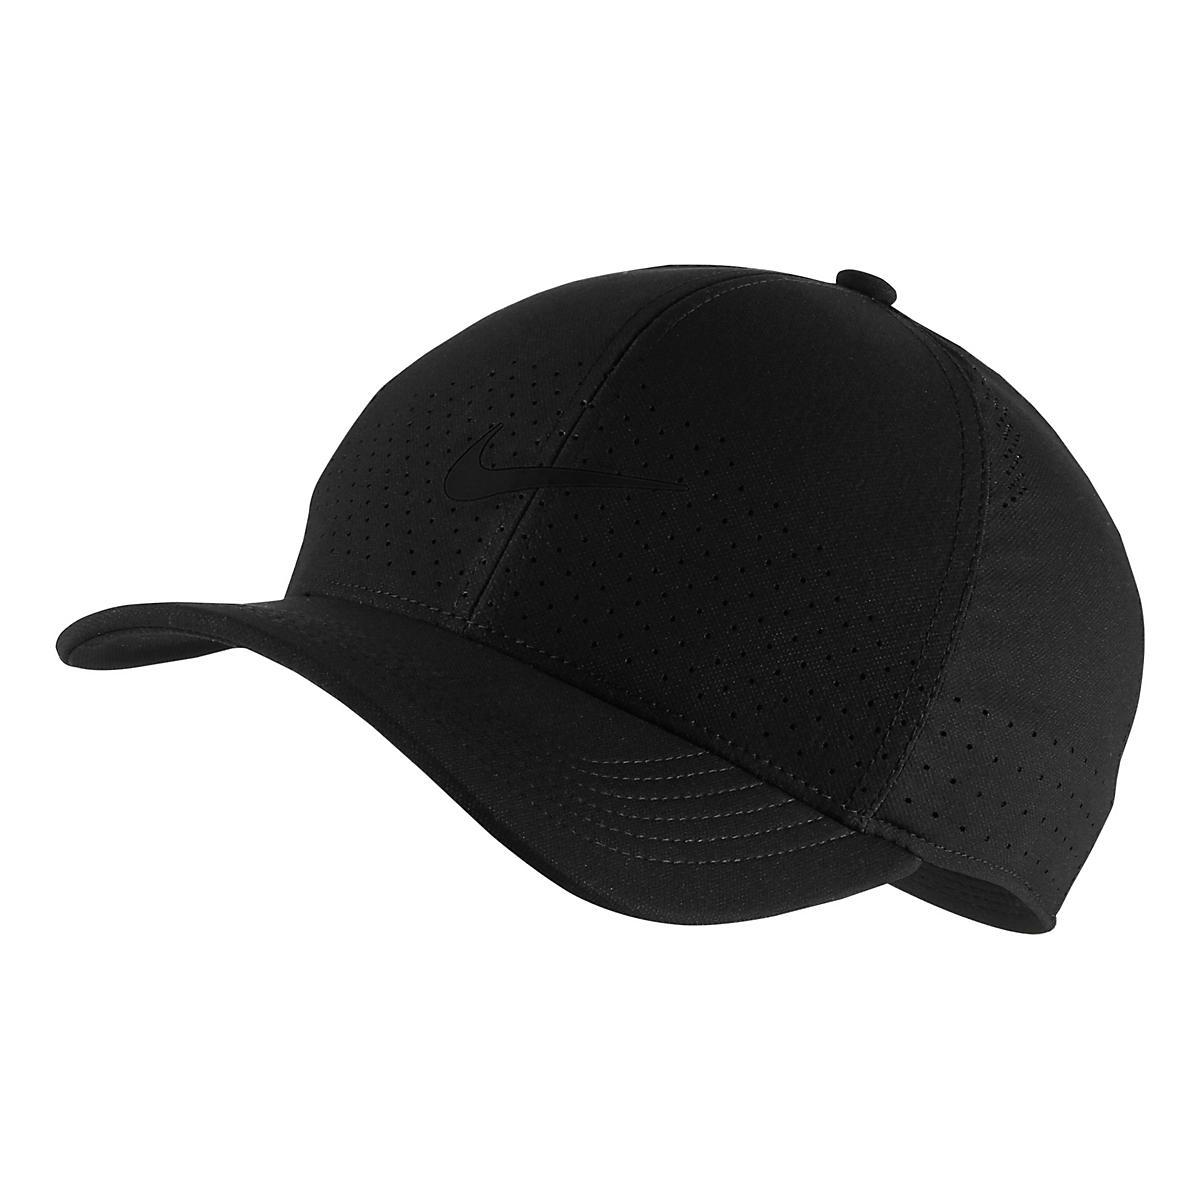 98c9fc769df Mens Nike Aerobill Classic 99 Hat Headwear at Road Runner Sports